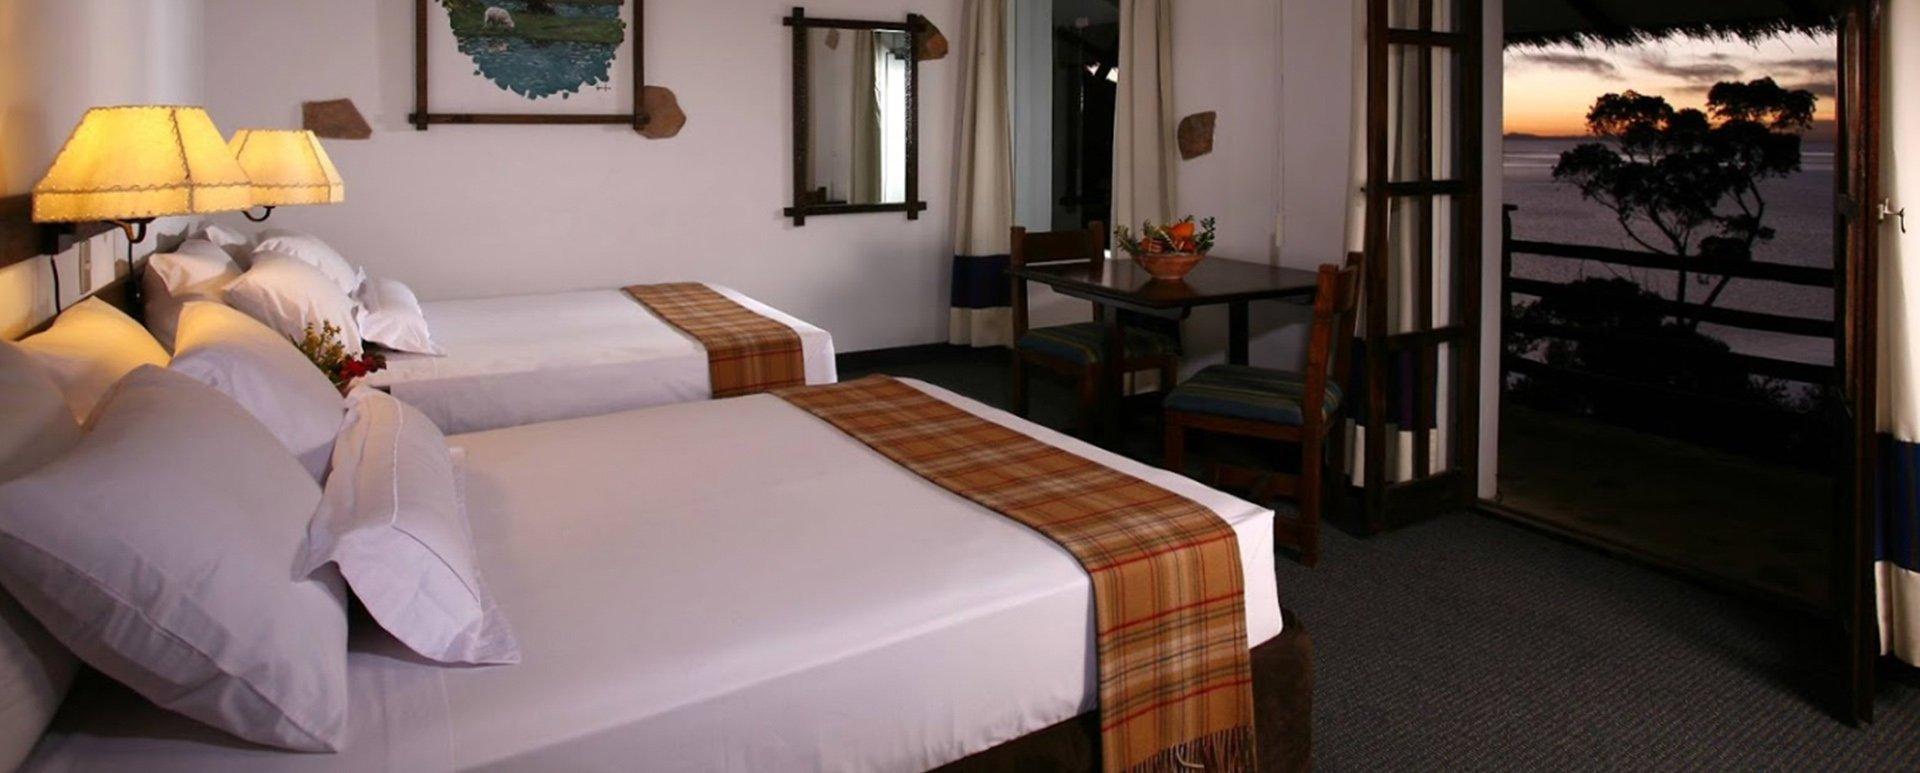 Suasi Island Lake Titicaca room